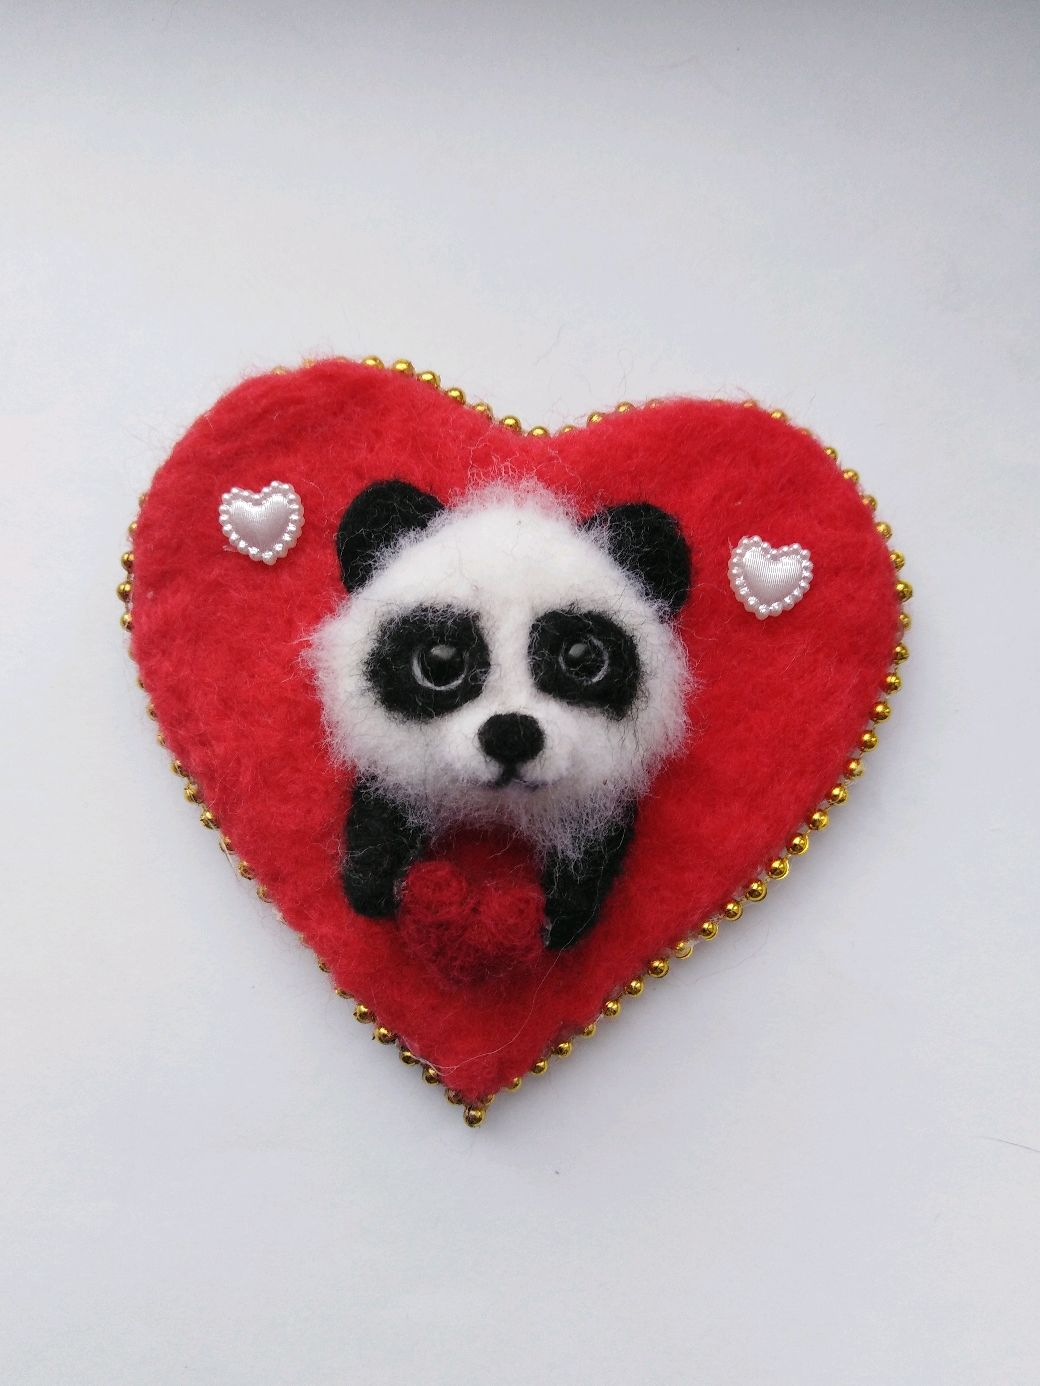 Магнит валентинка из шерсти, Магниты, Пенза,  Фото №1